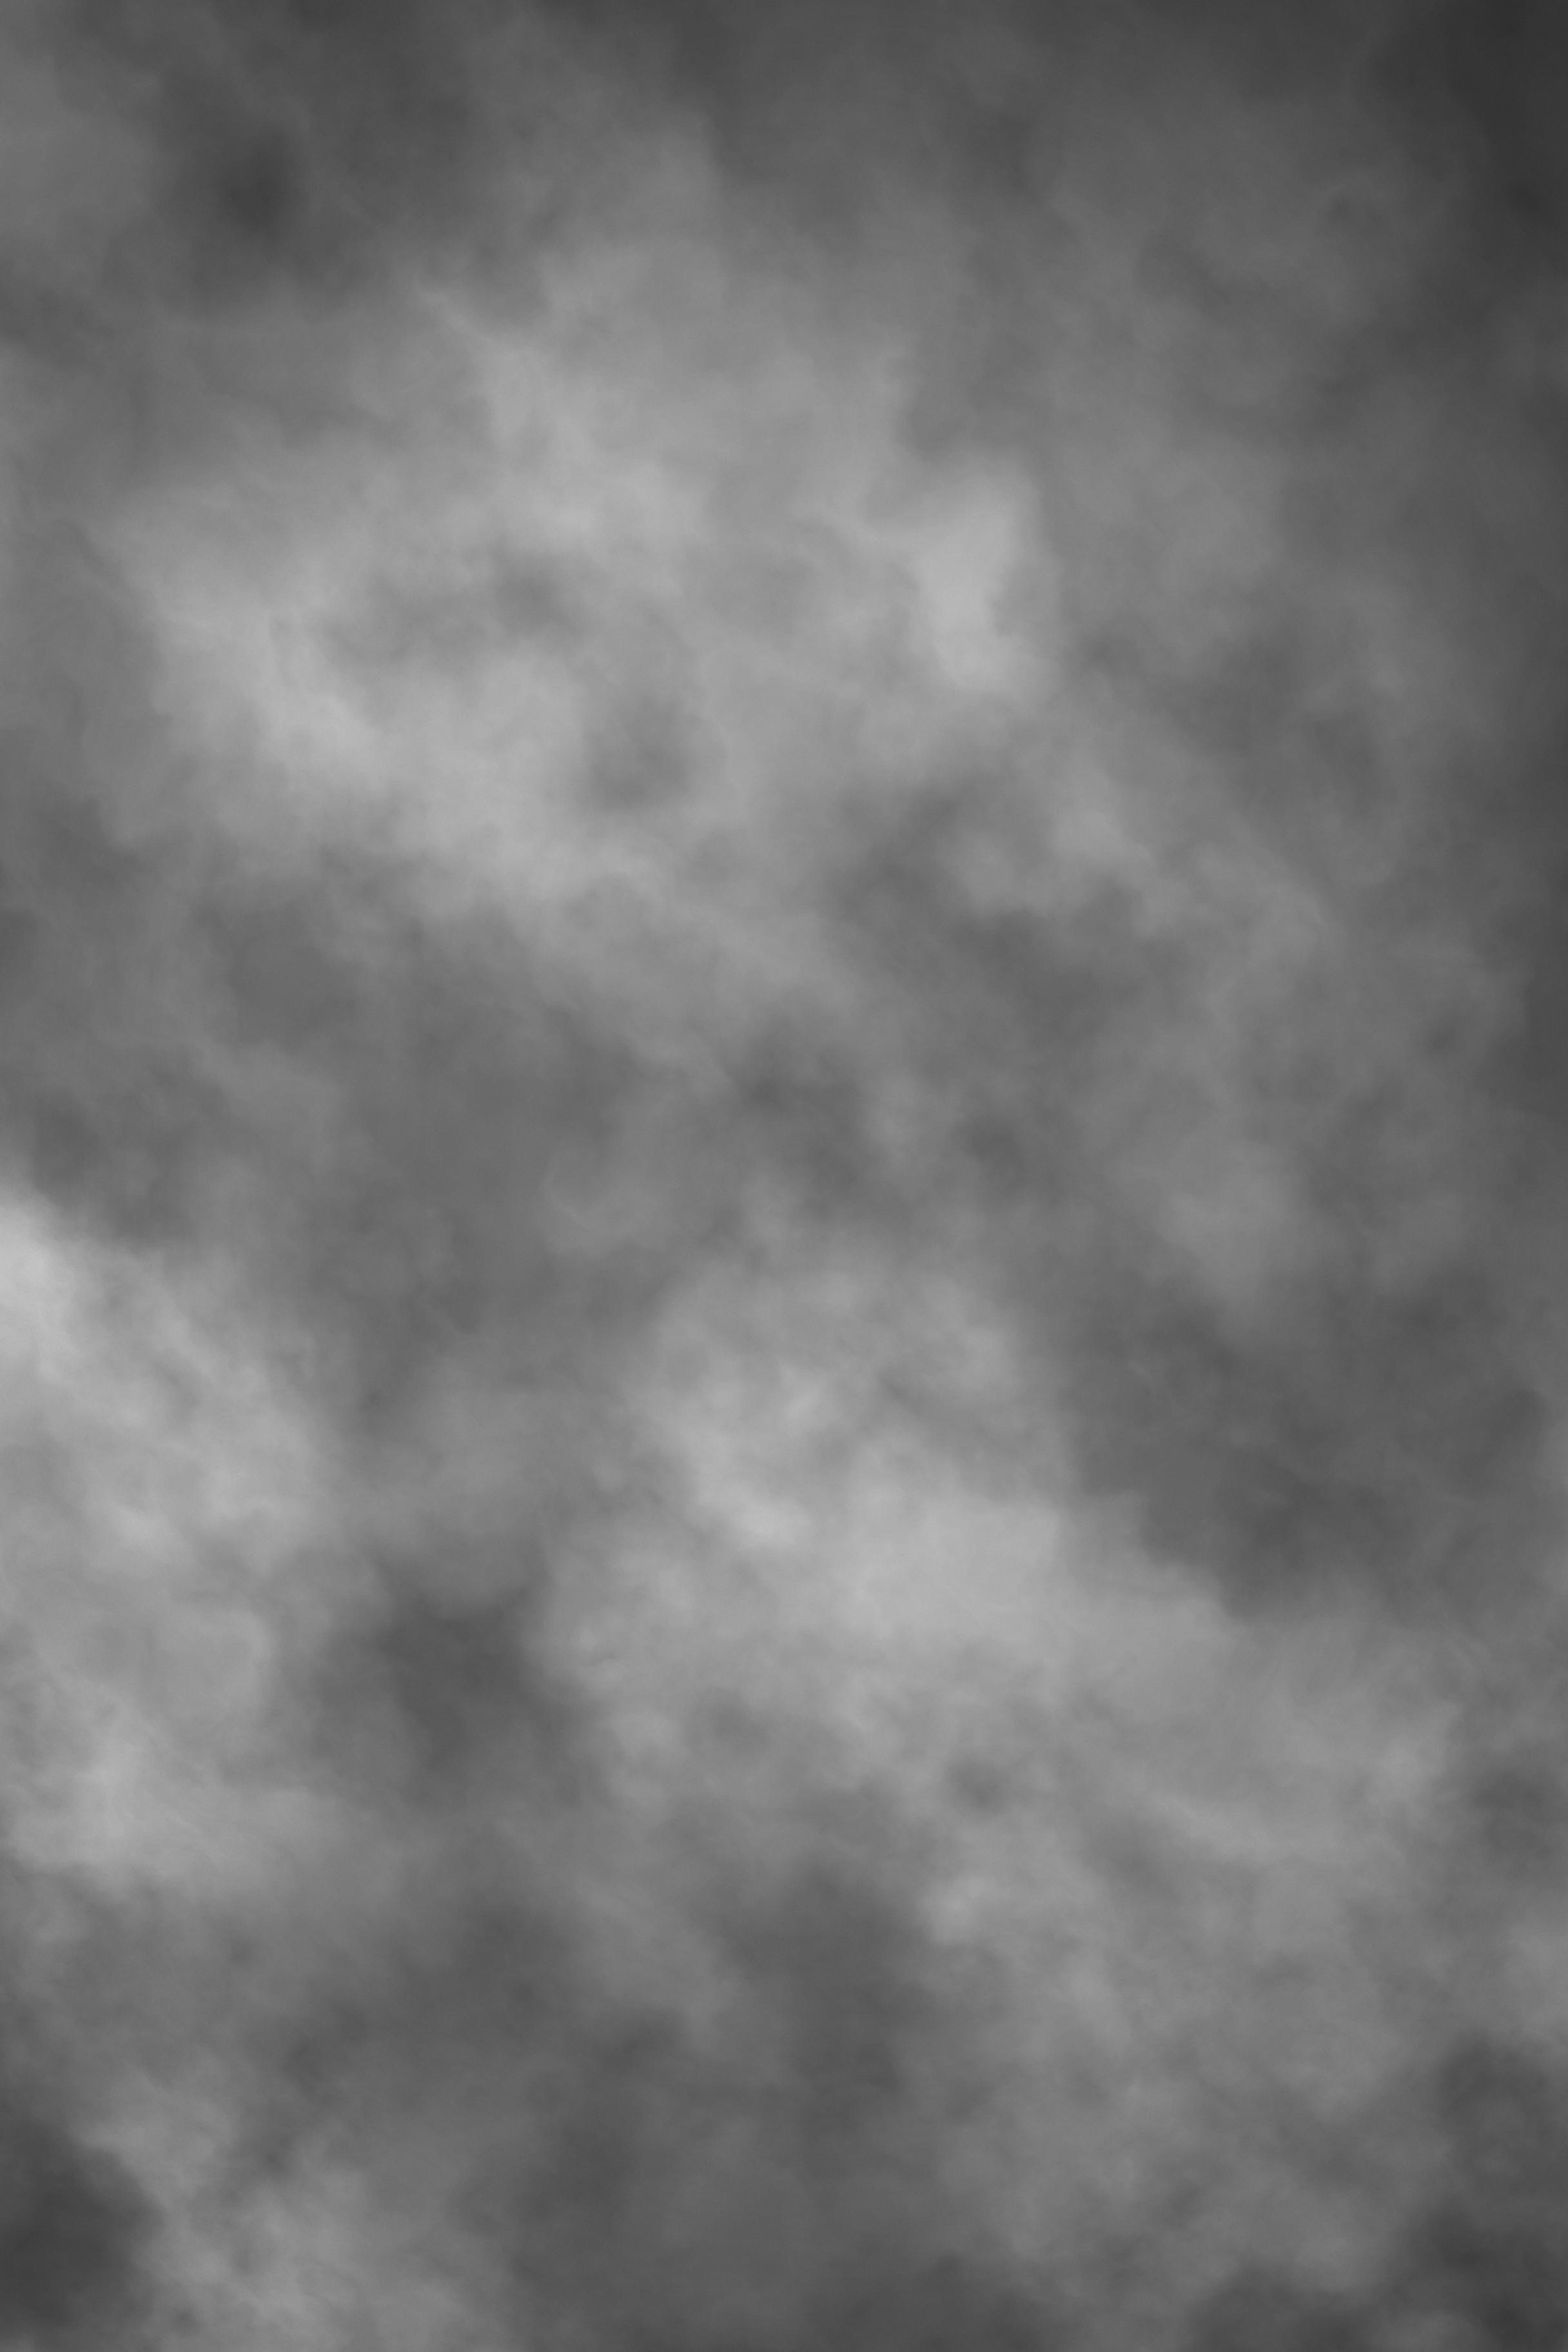 1. Gray